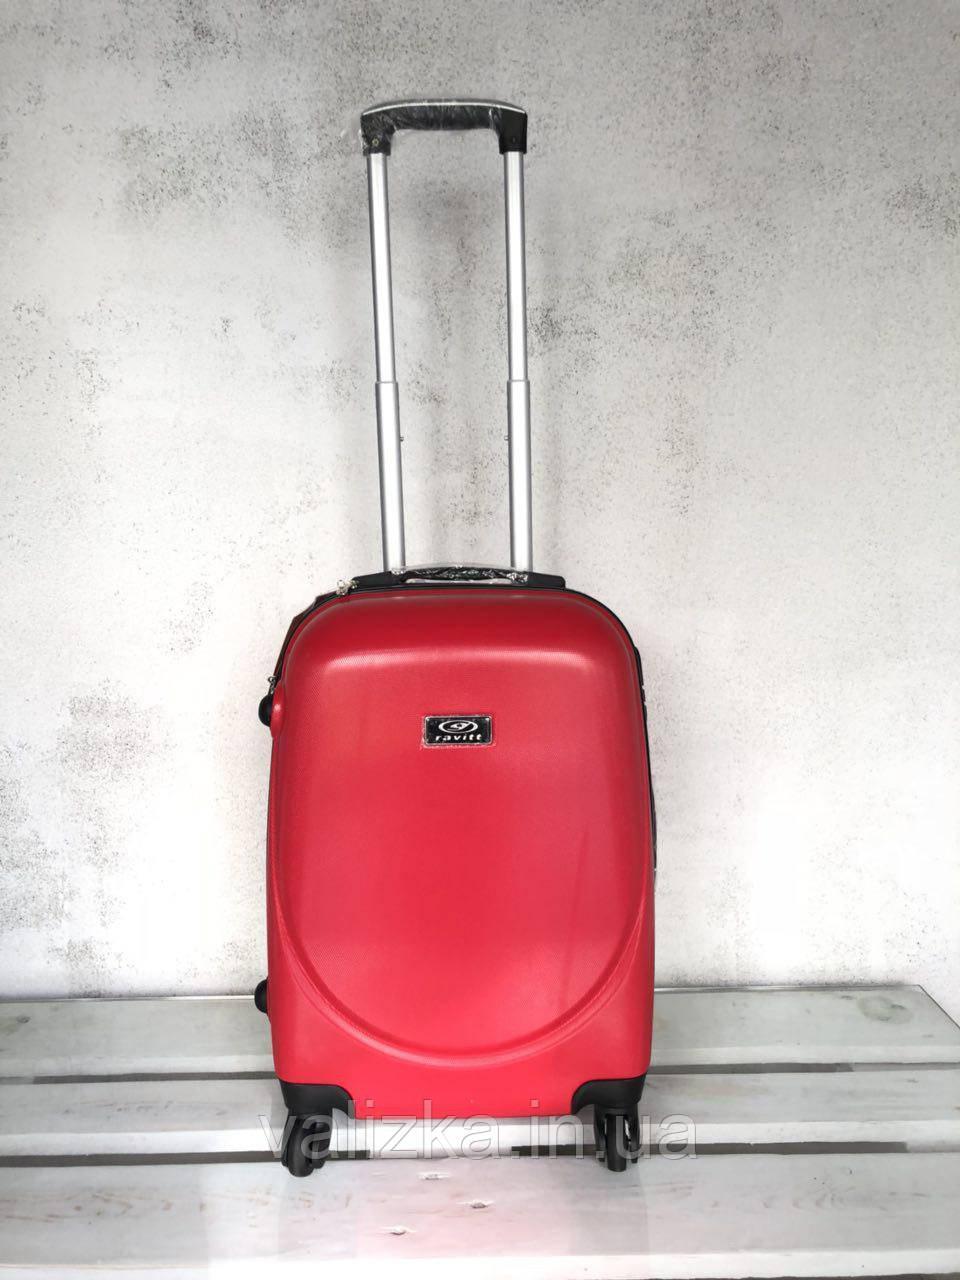 Валіза пластикова для ручної поклажки червона S+. Пластиковый чемодан для ручной клади красный. Польша